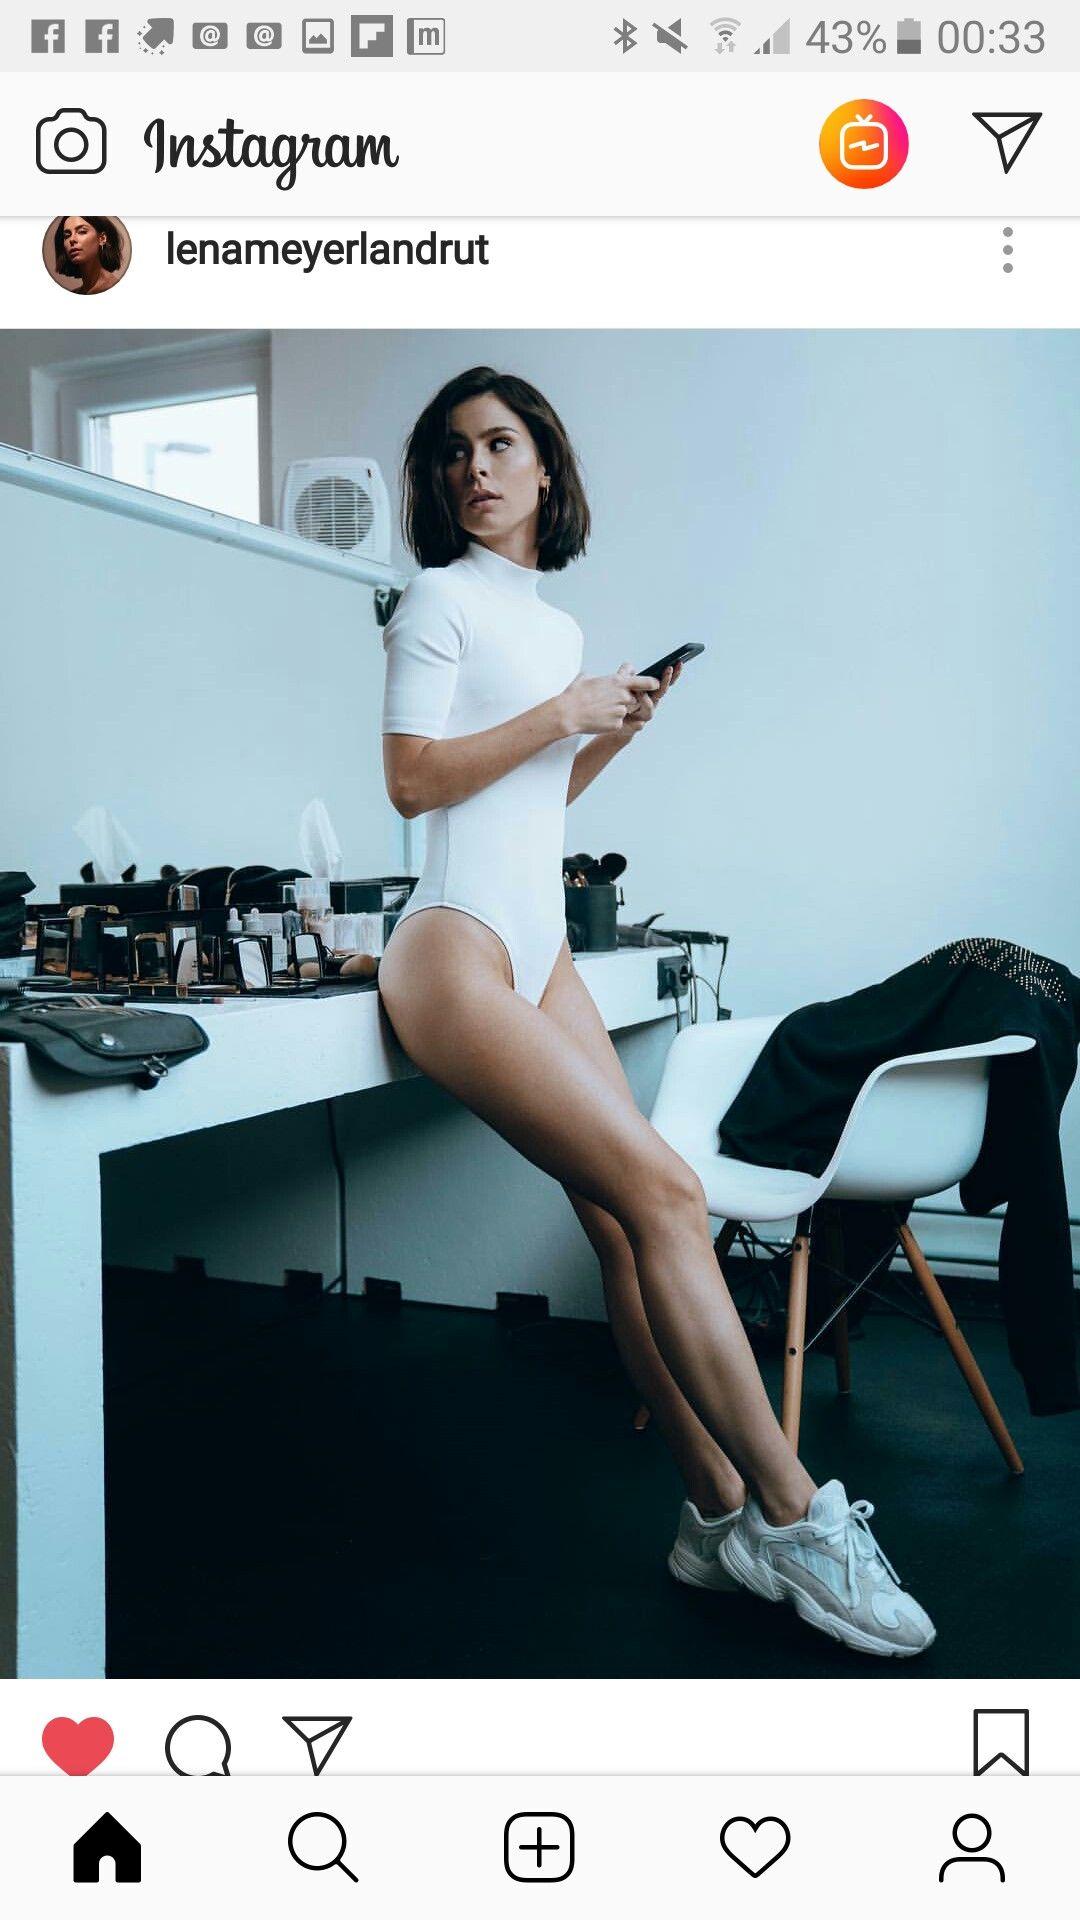 Meyer-landrut hot lena Sexy Lena